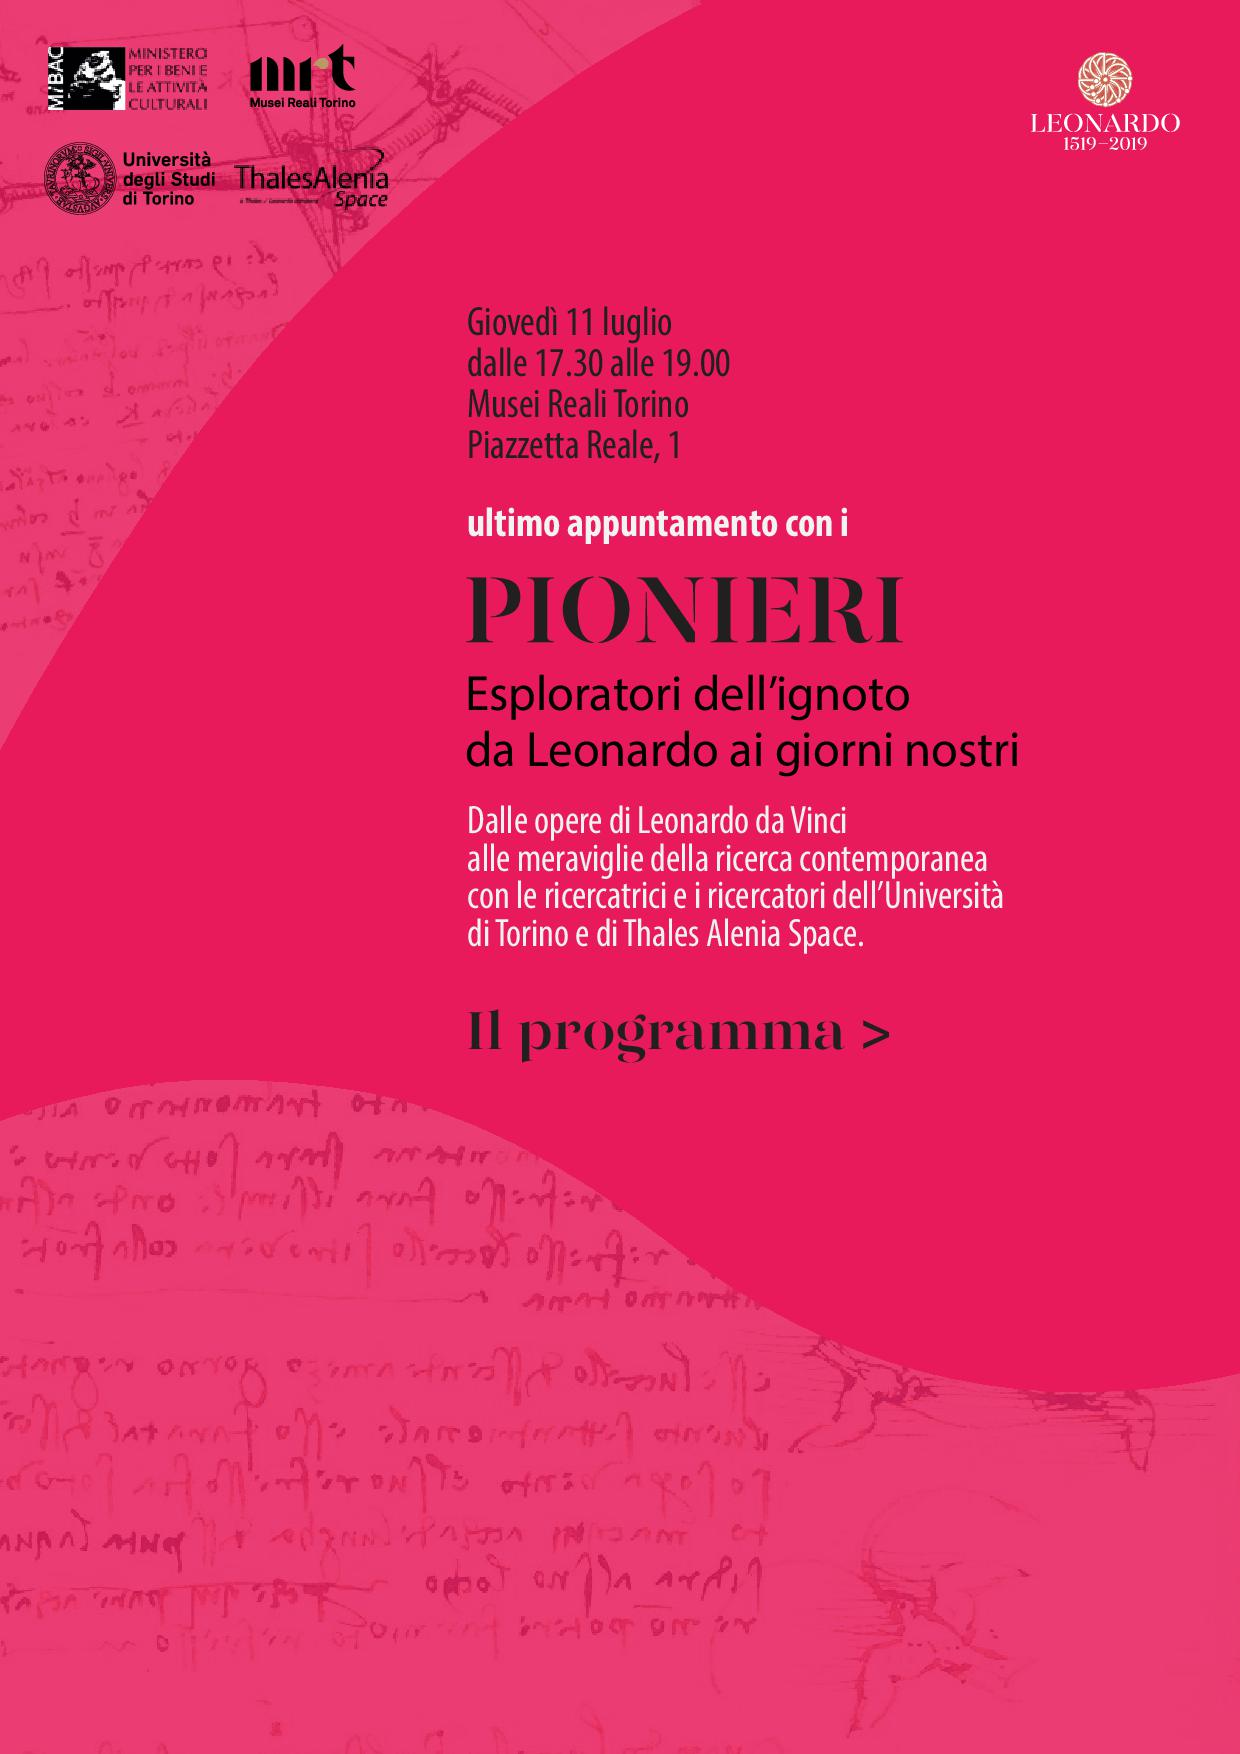 pionieri_programma chiusura_11 luglio01